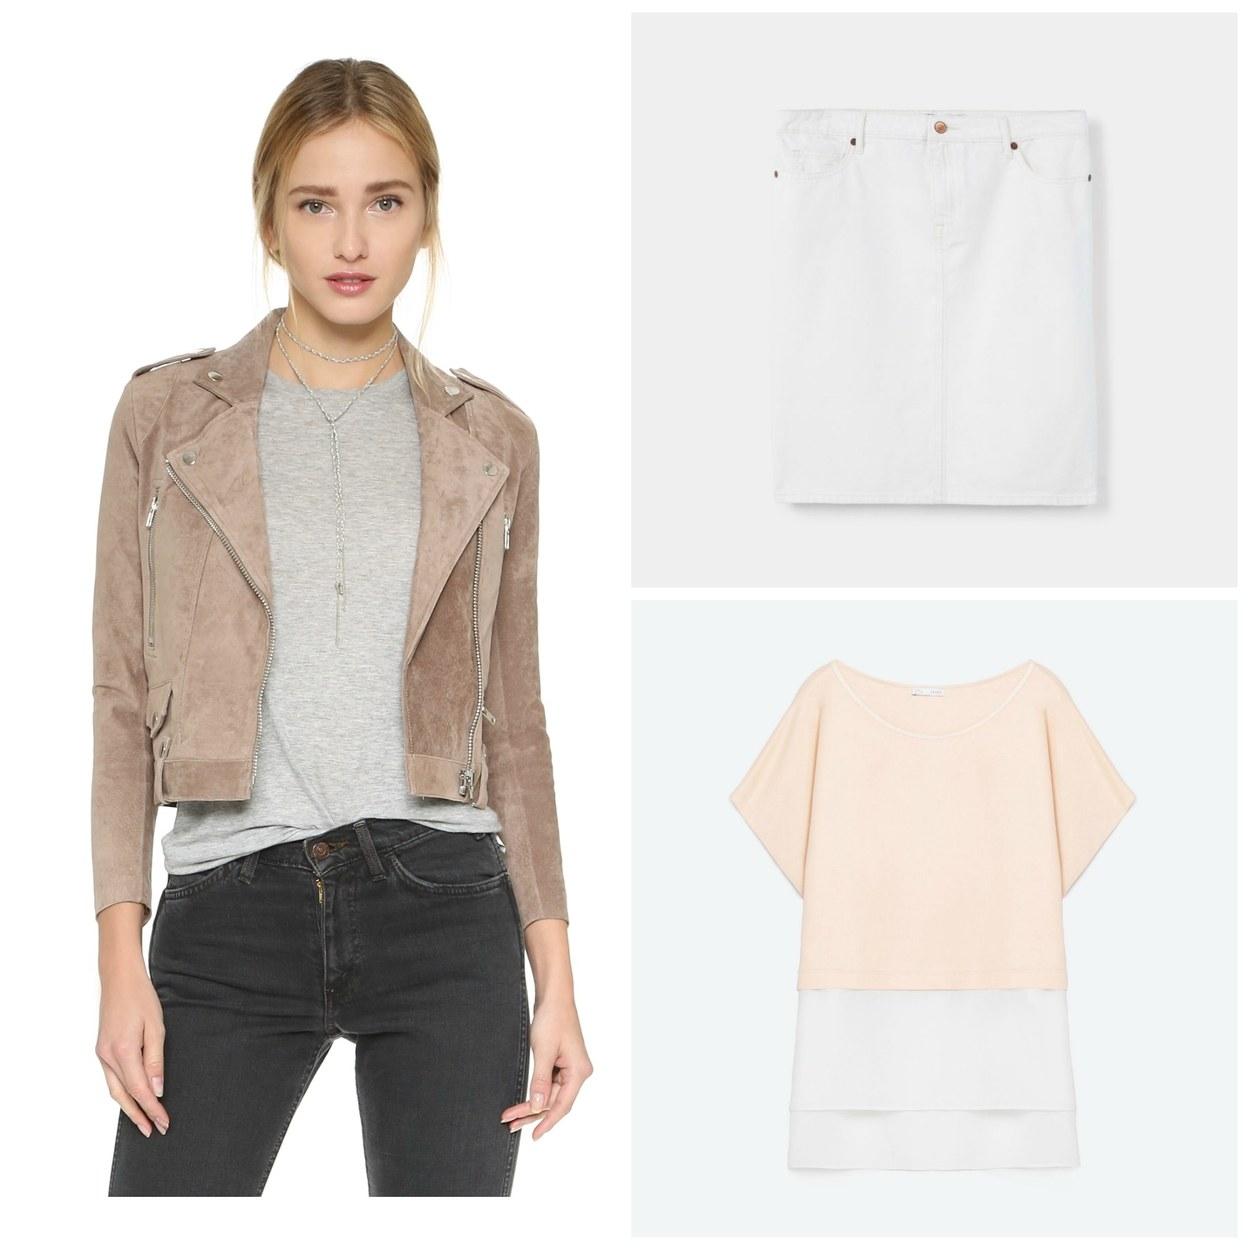 white-pencil-skirt-white-tee-tan-jacket-moto-spring-summer-casualfriday-work.jpg